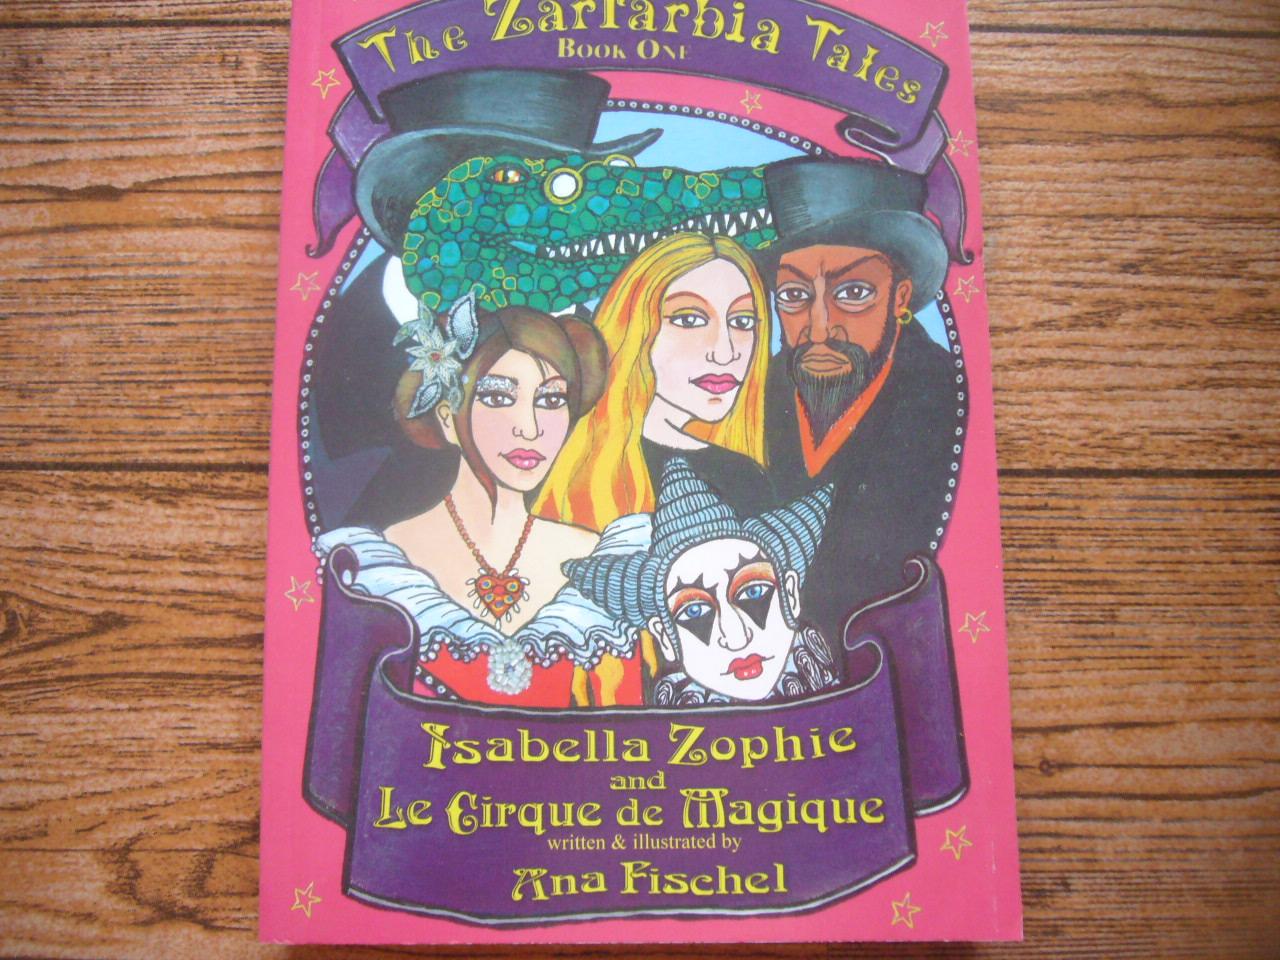 The Zartarbia Tales Book One: Isabella Zophie and Le Cirque de Magique